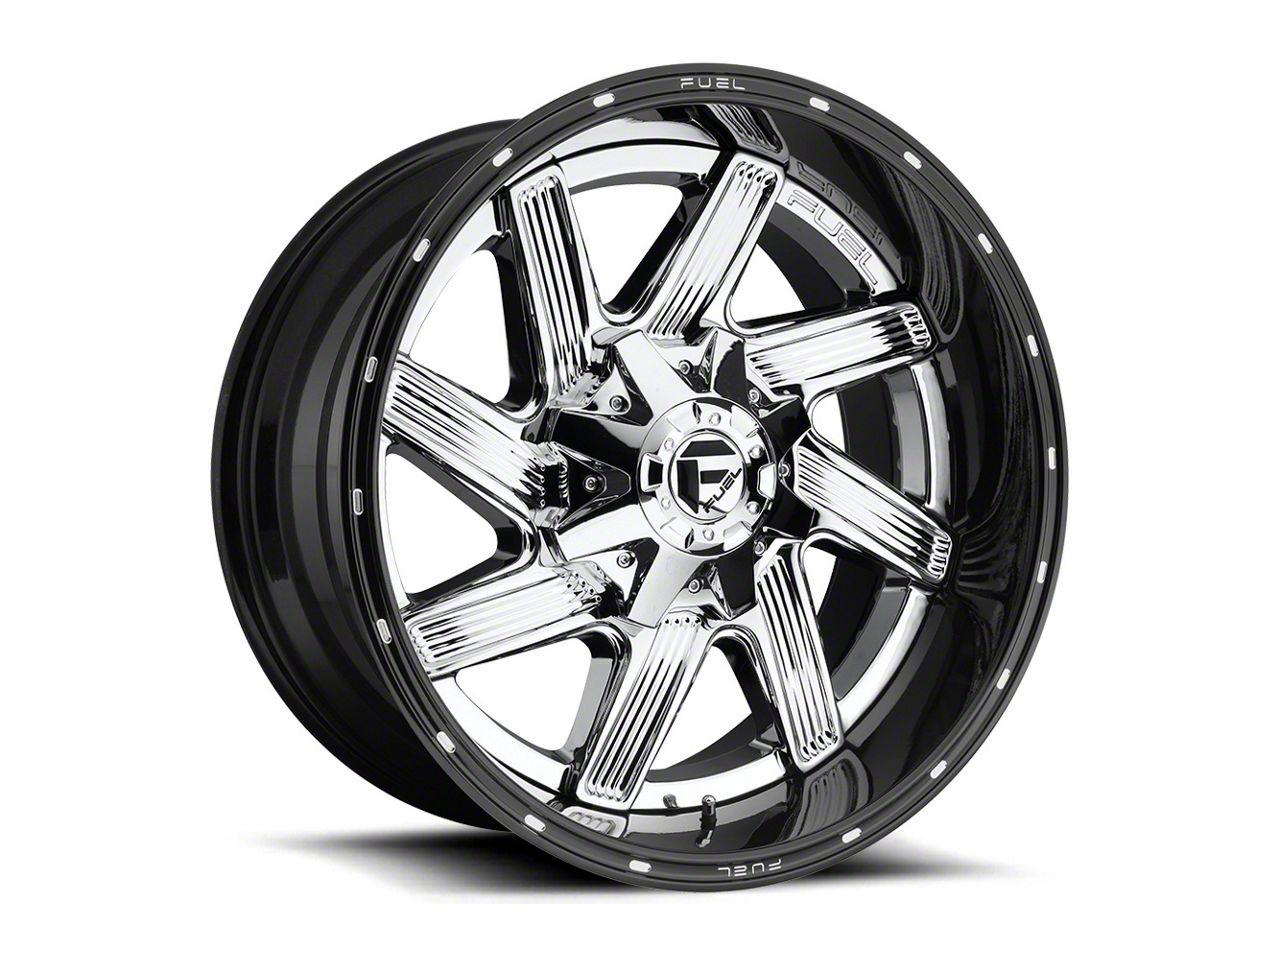 Fuel Wheels Moab Chrome 6-Lug Wheel - 22x14 (07-18 Sierra 1500)